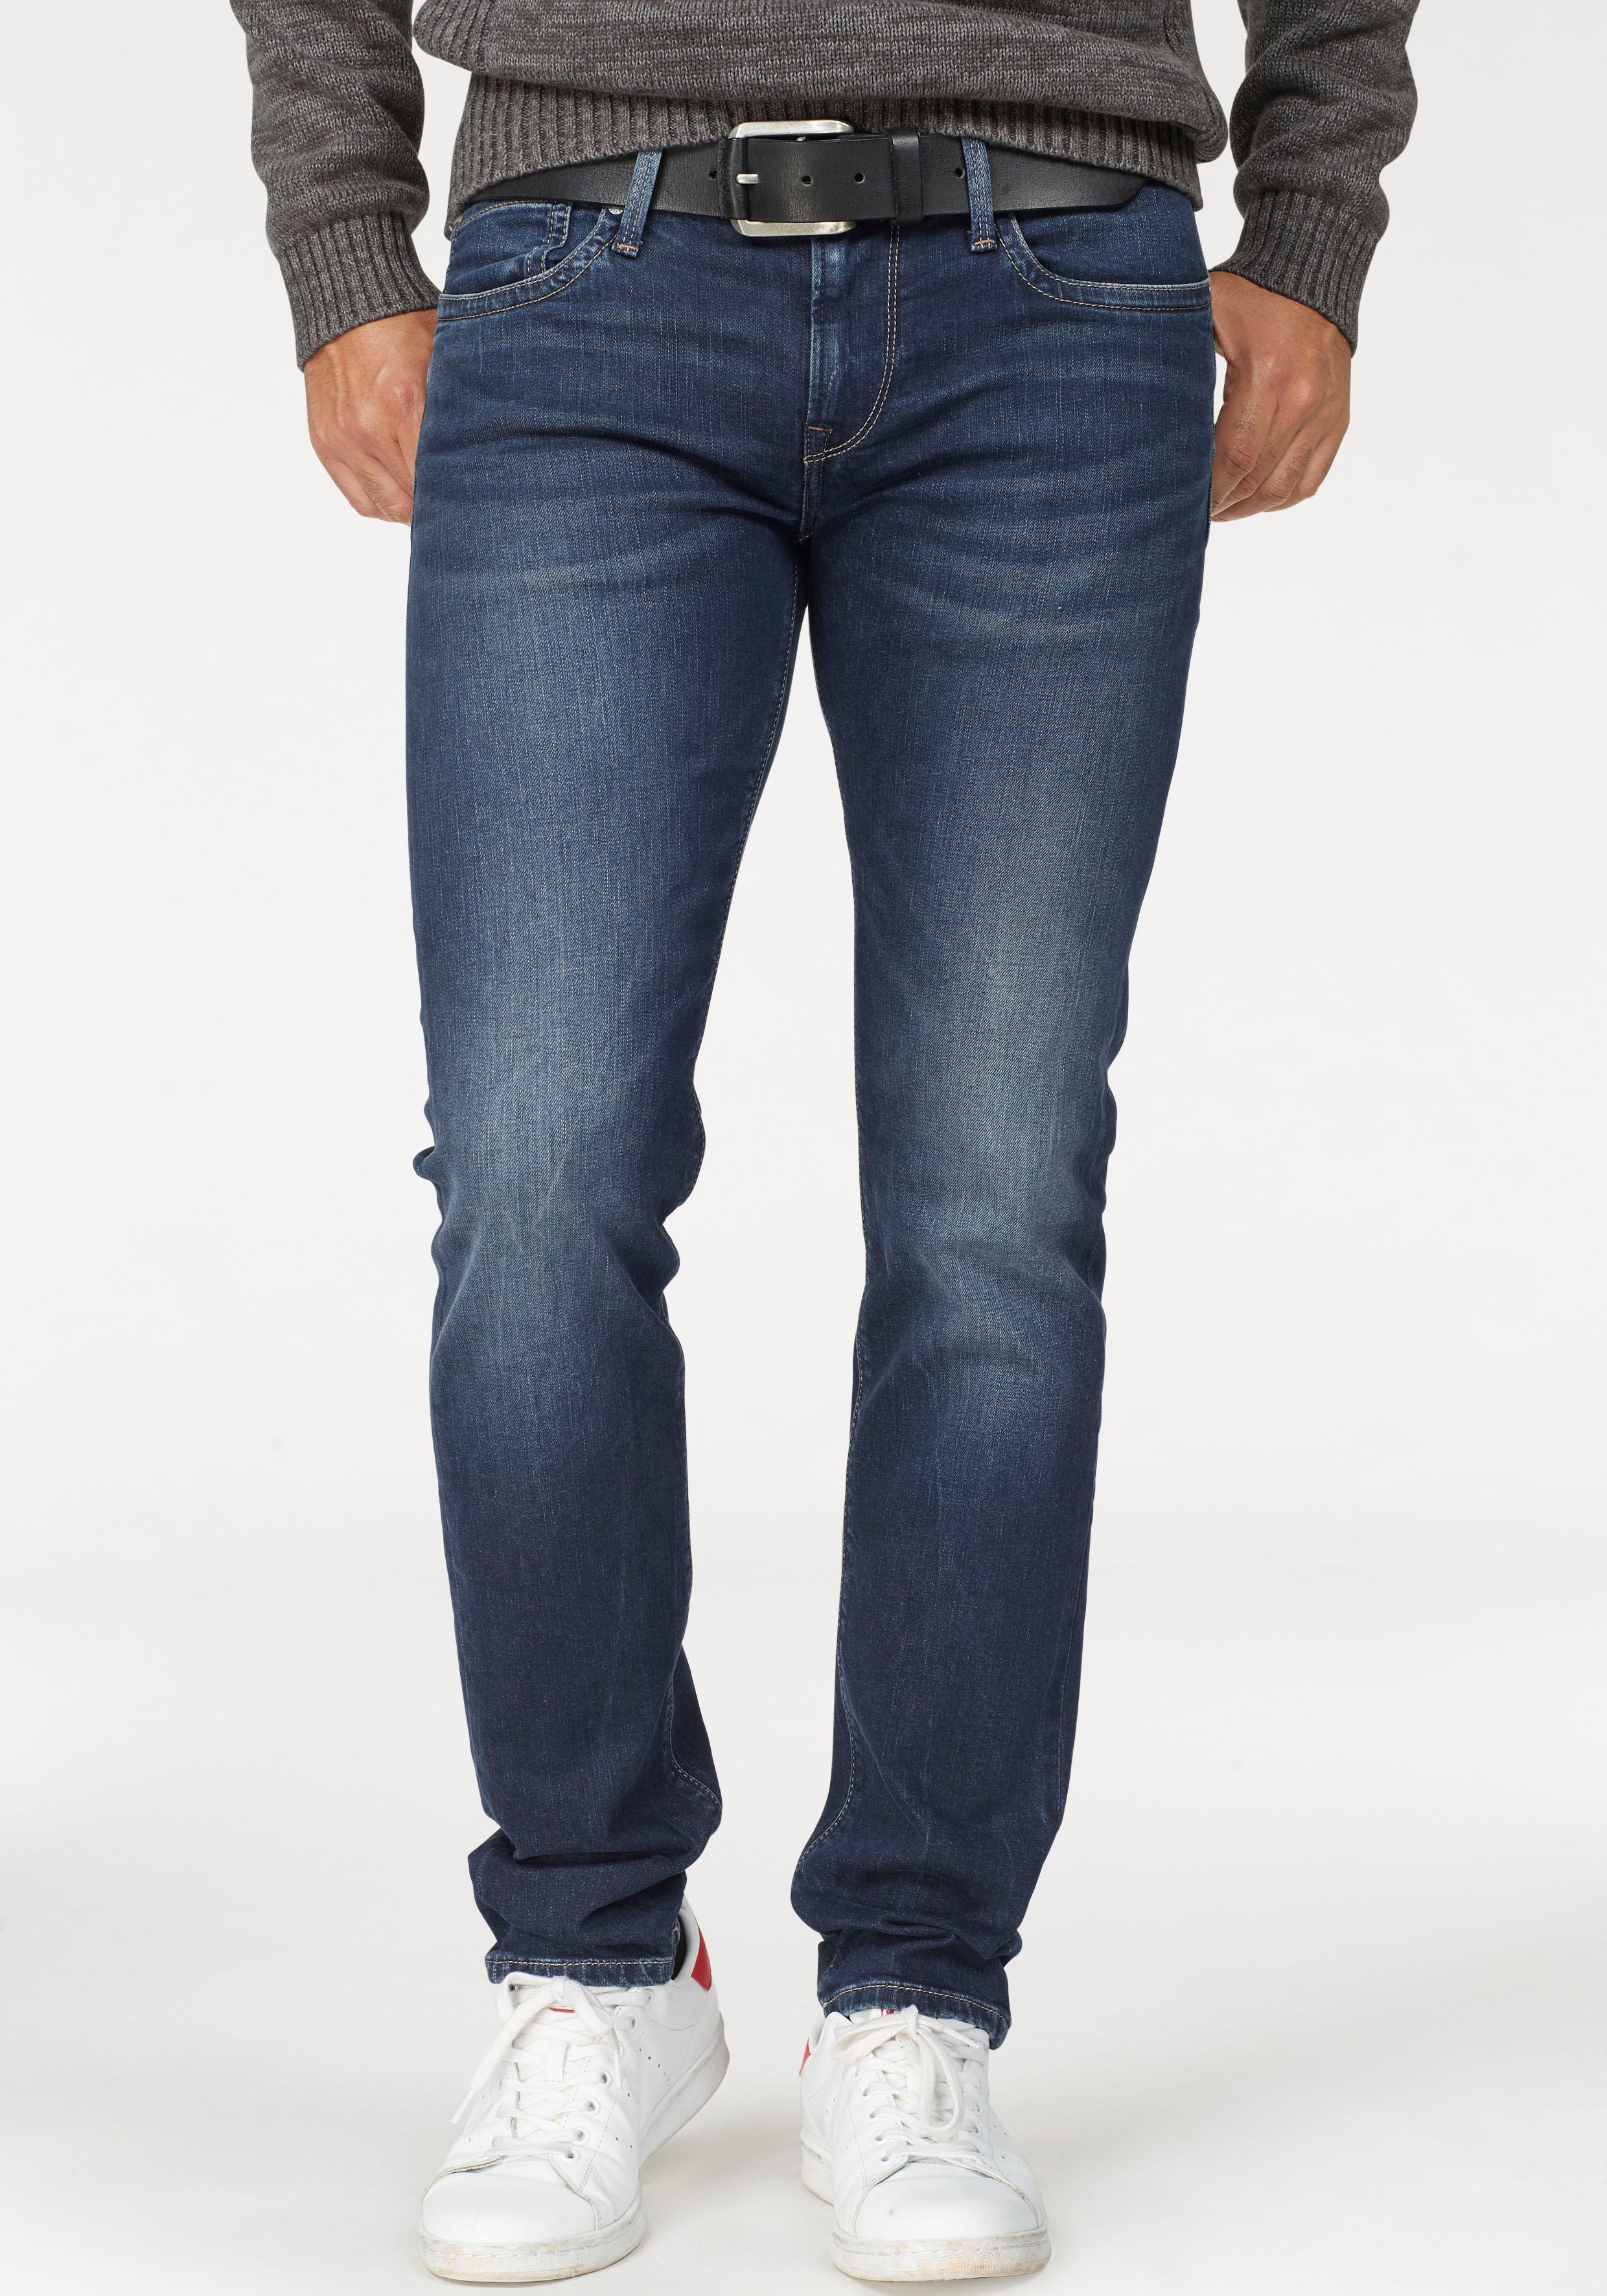 Pepe Jeans Slim-fit-Jeans »HATCH« | Bekleidung > Jeans > Slim Fit Jeans | Blau | PEPE JEANS